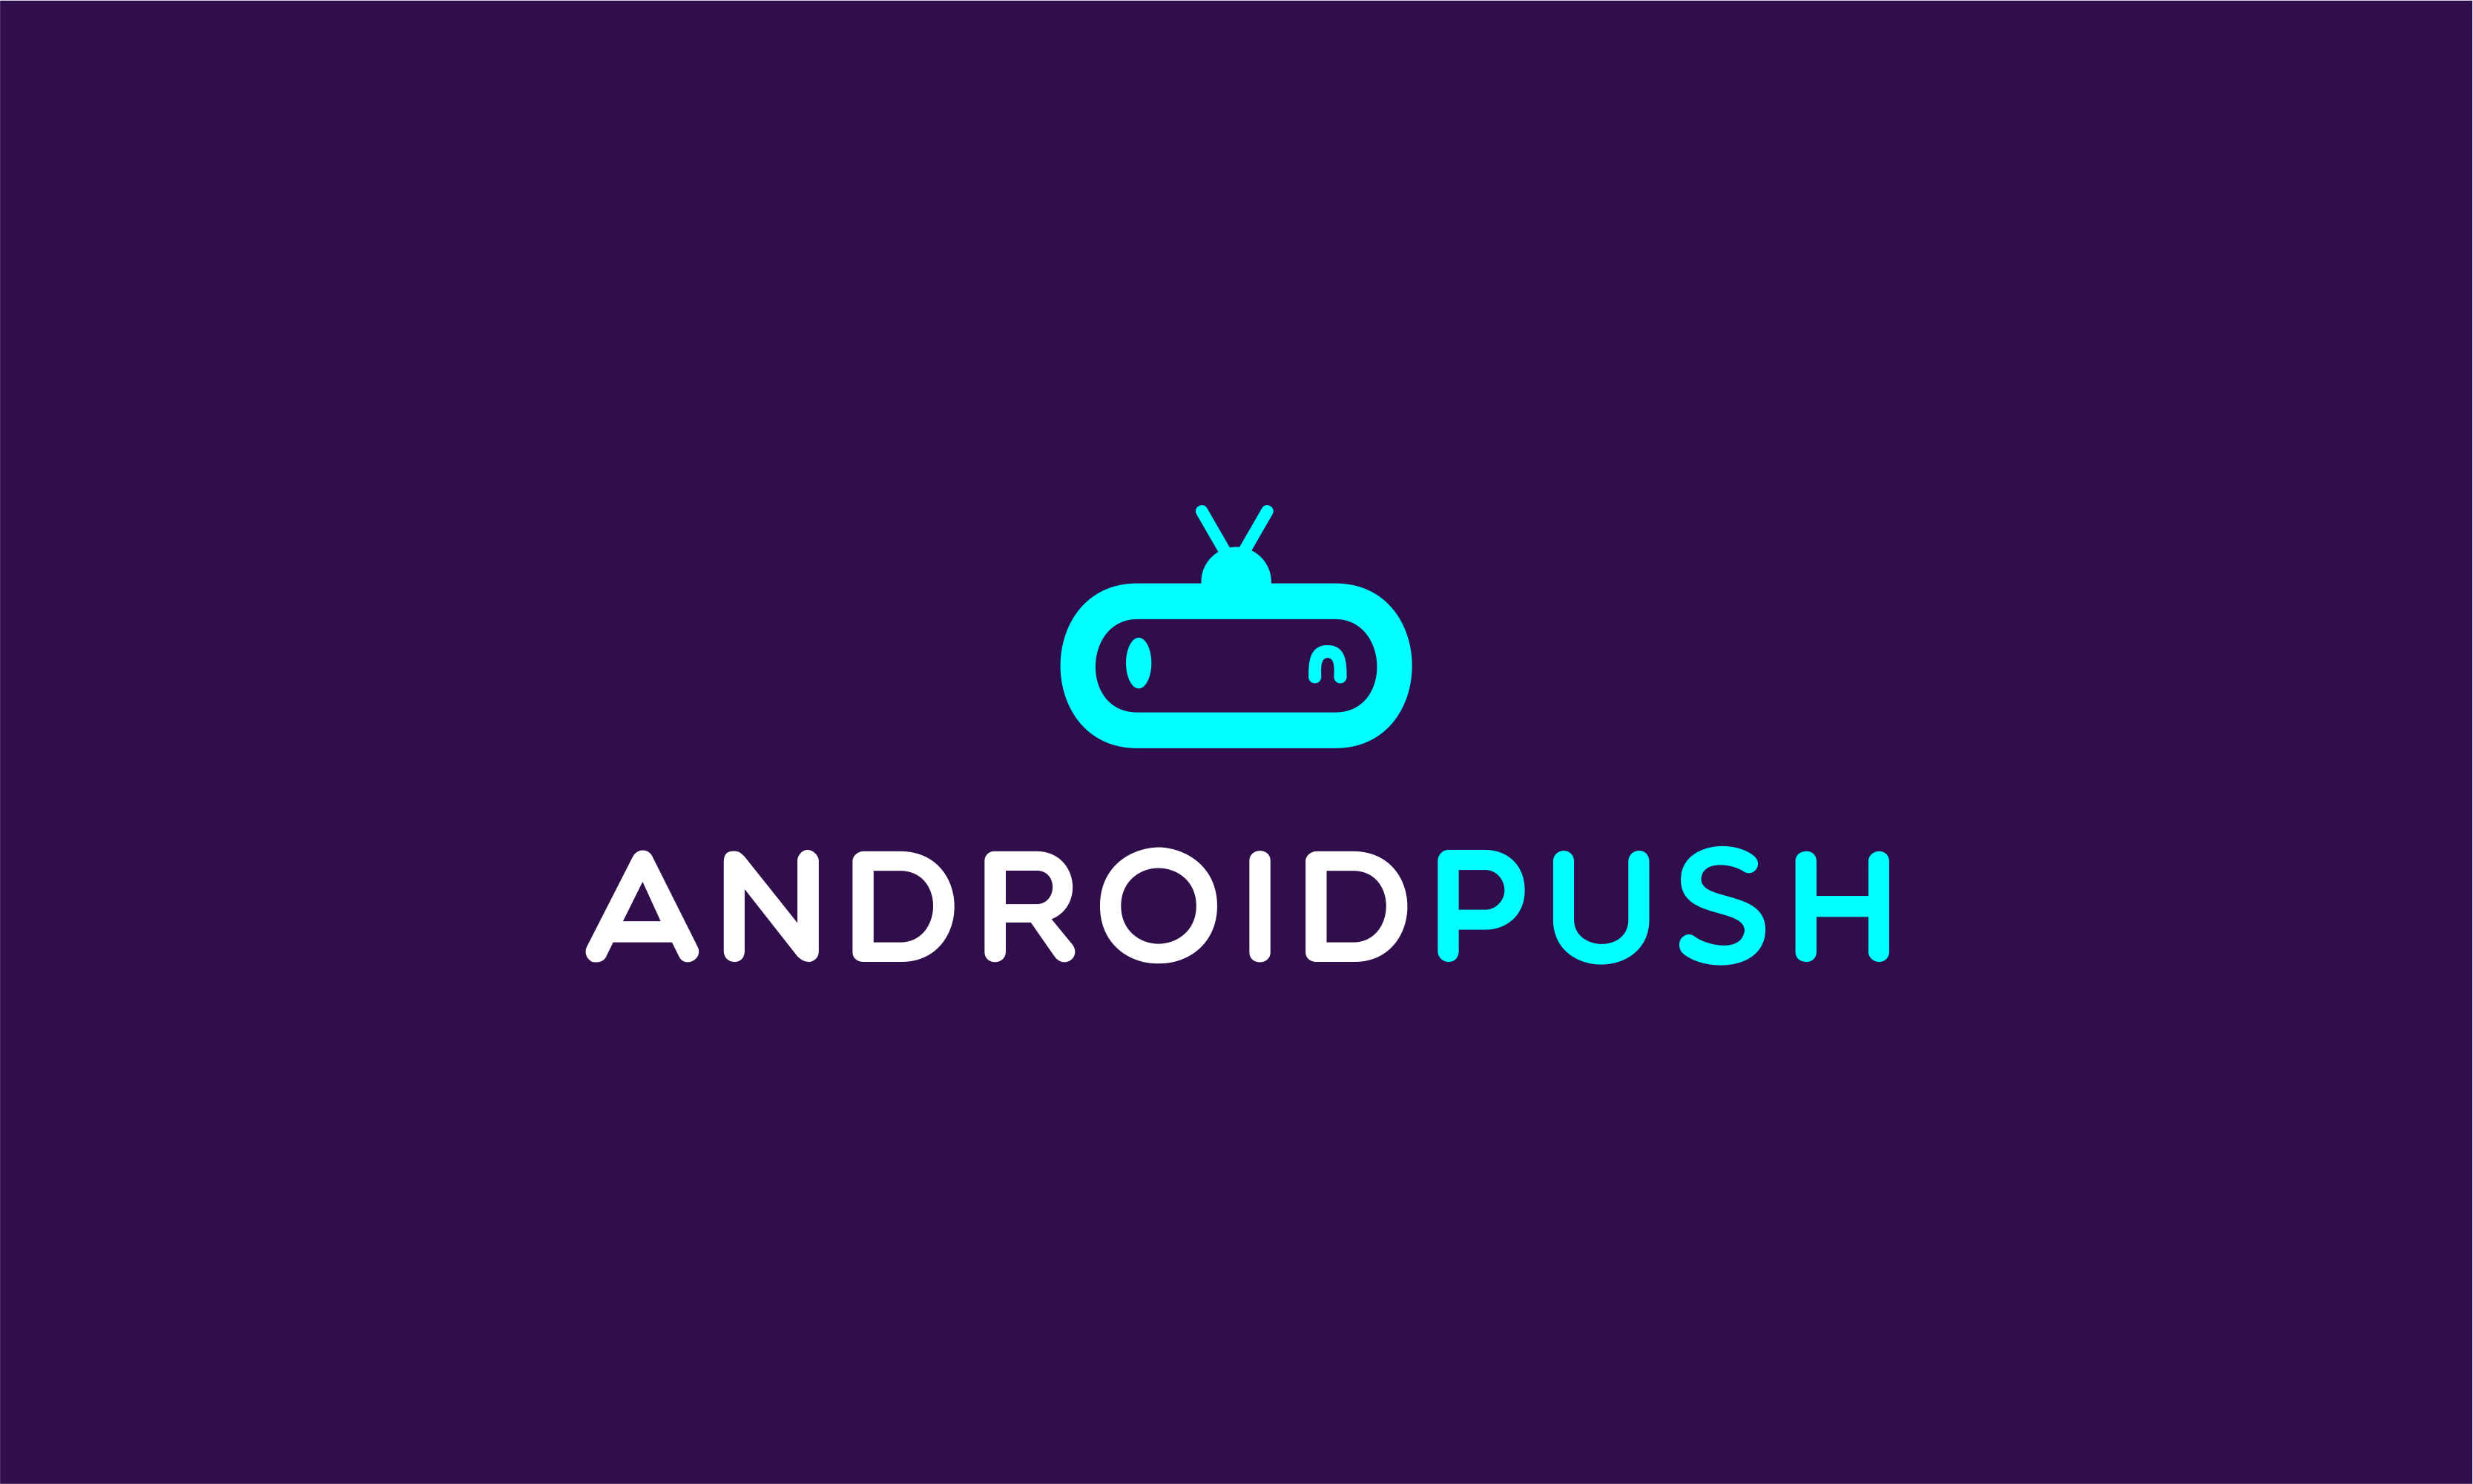 Androidpush